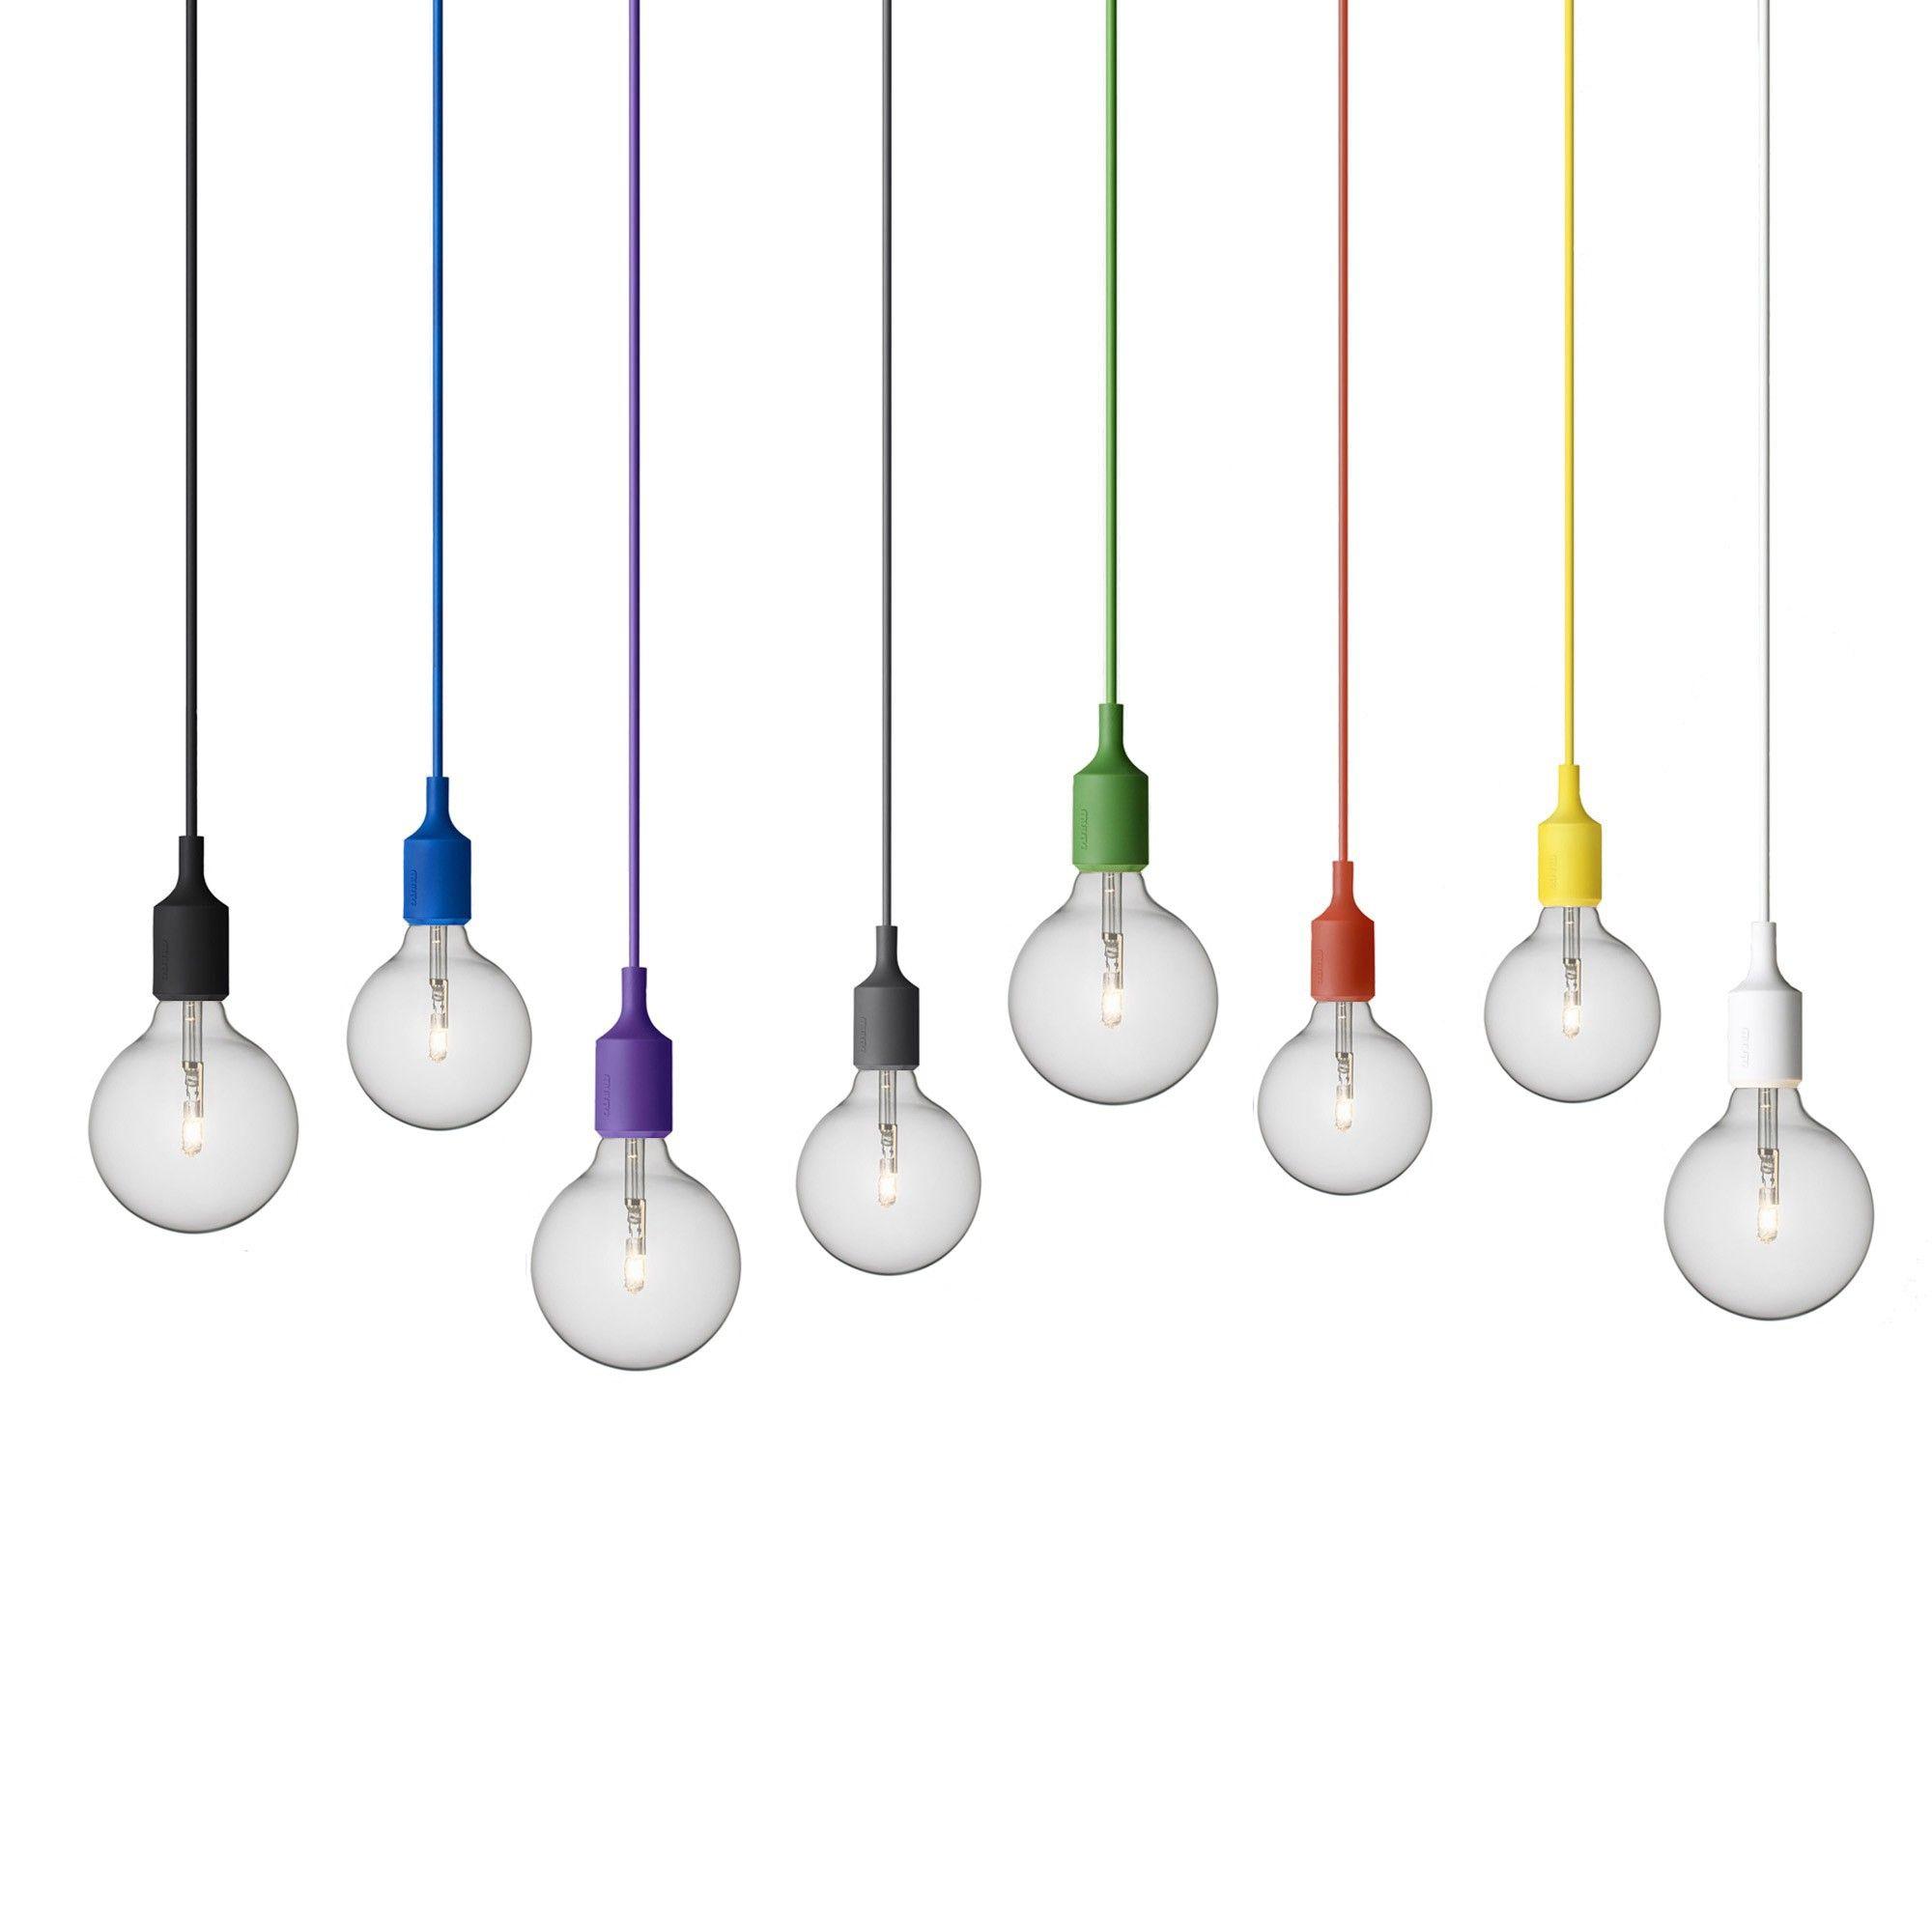 E pendant lamp by muuto lighting pinterest pendant lamps